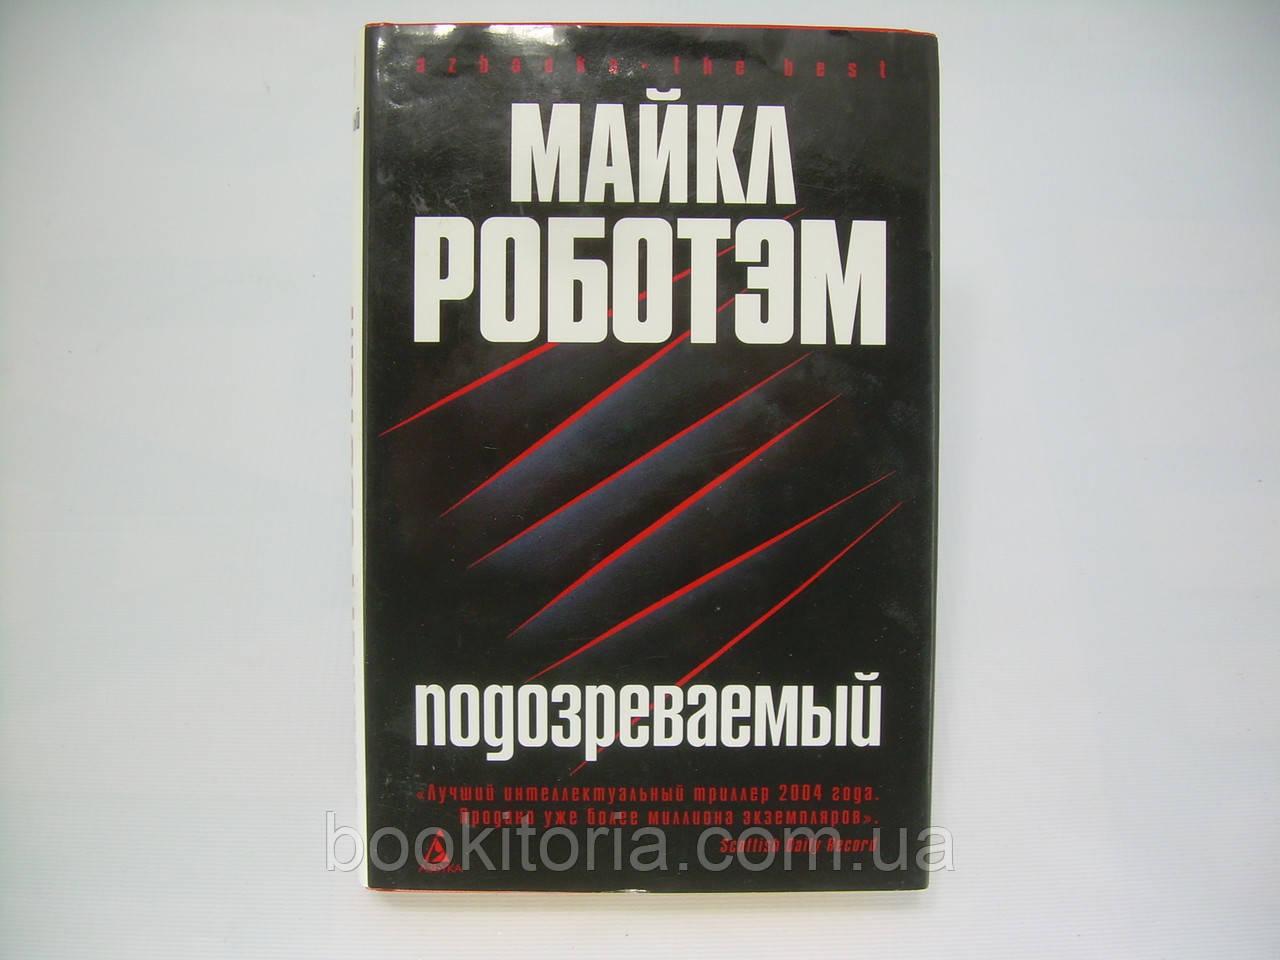 Роботэм М. Подозреваемый (б/у).